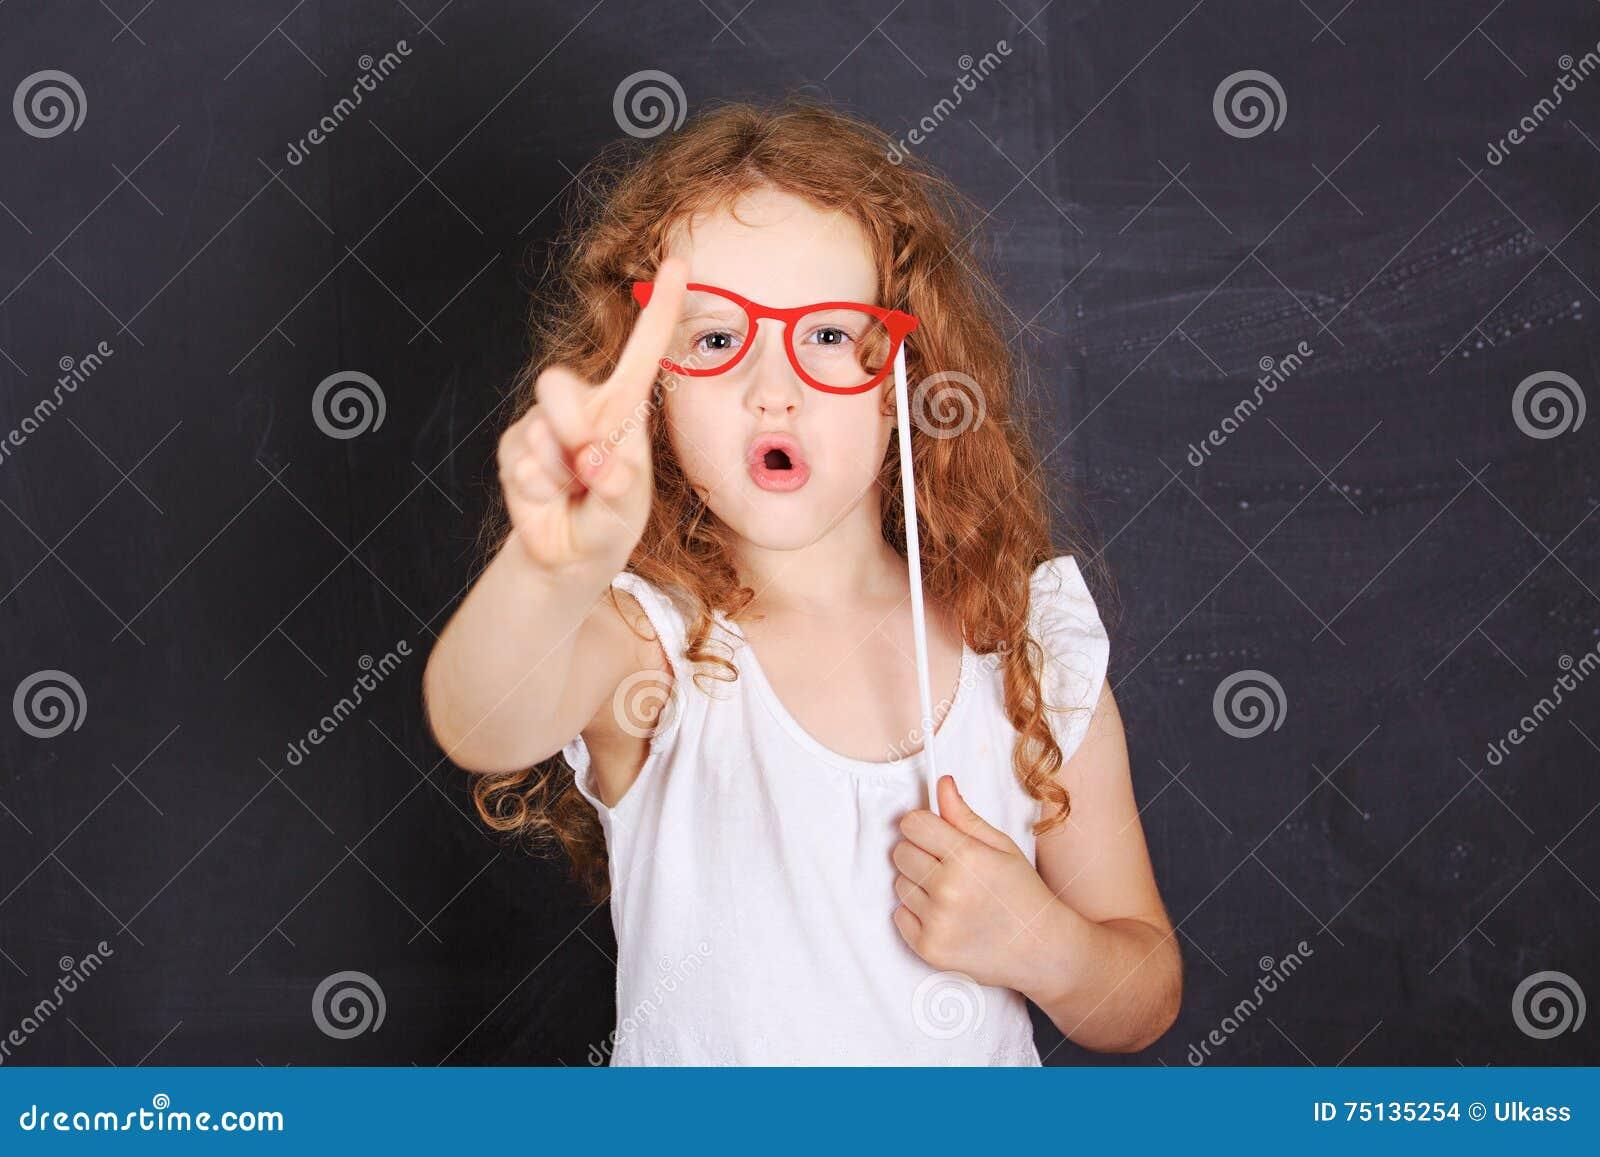 Little girl showing shaking finger saying no